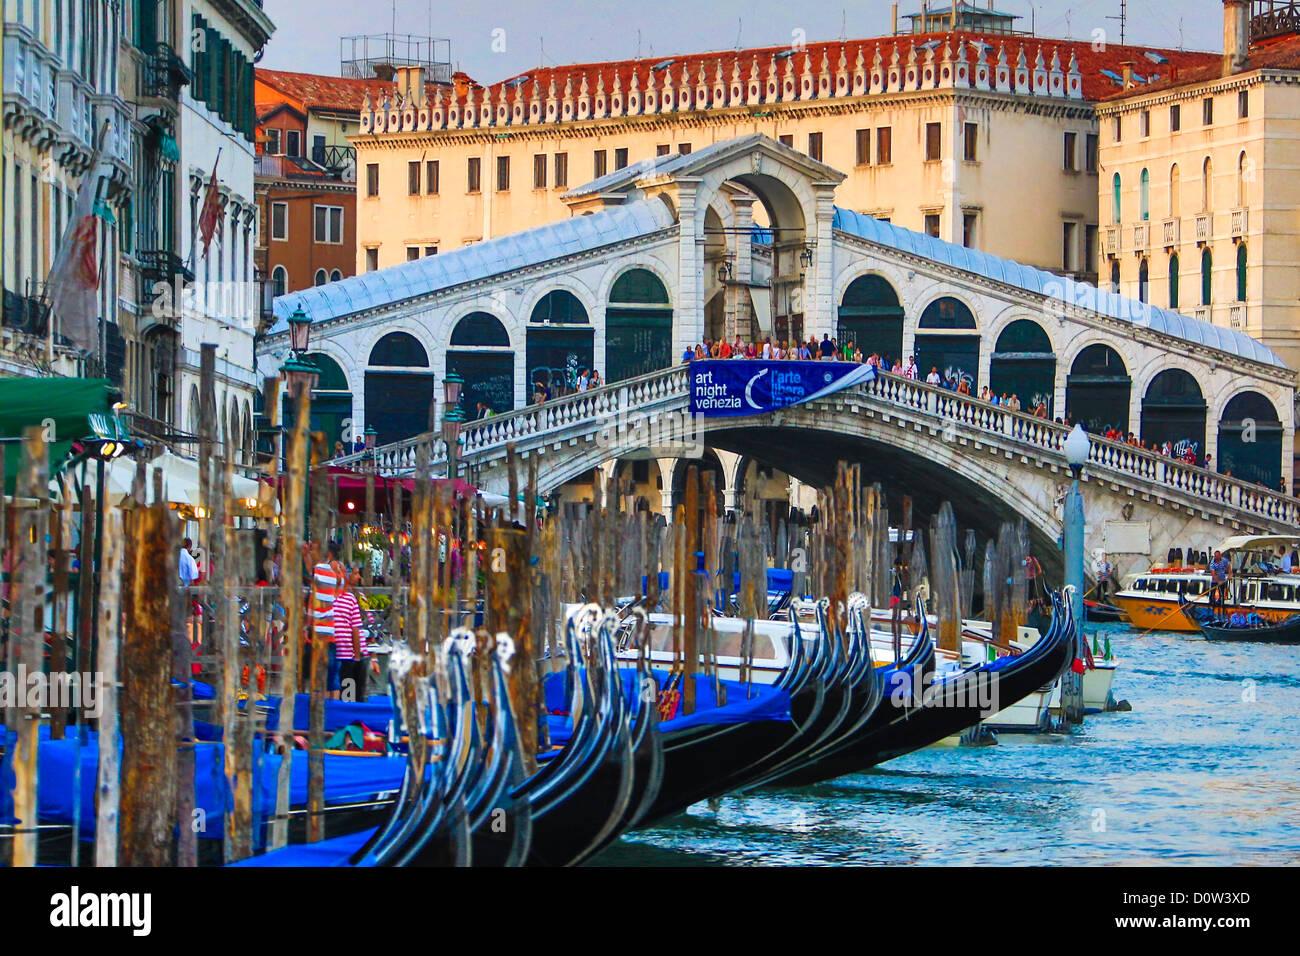 Italy, Europe, travel, Venice, Rialto, Bridge, architecture, boats, canal, colours, gondolas, Canal Grande, tourism, - Stock Image